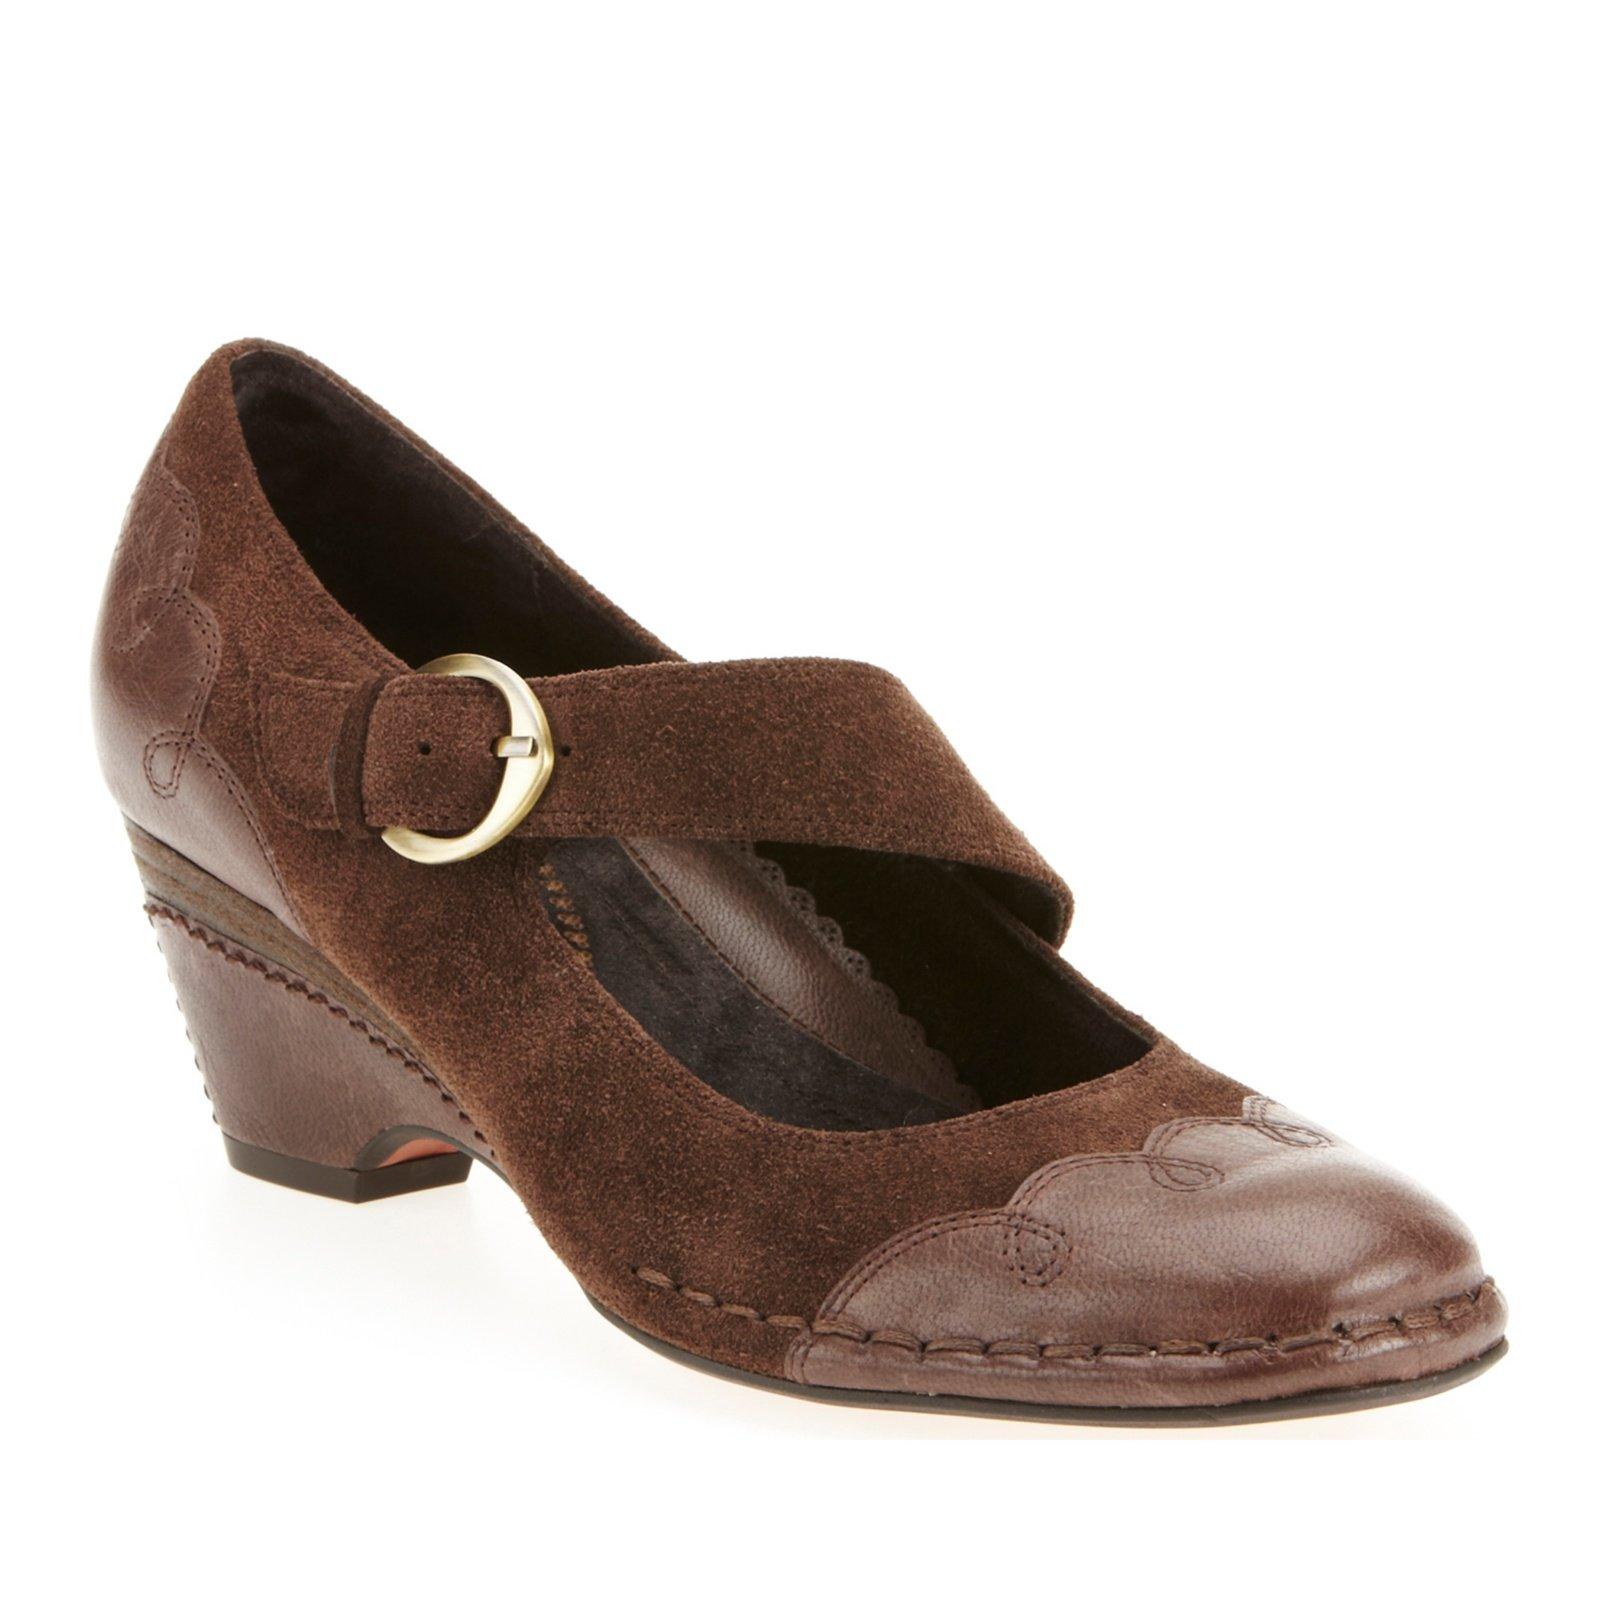 Antia Shoes Women's Renee Mary Janes,Mocha Vintage Full Grain/Cow Suede,8 W US